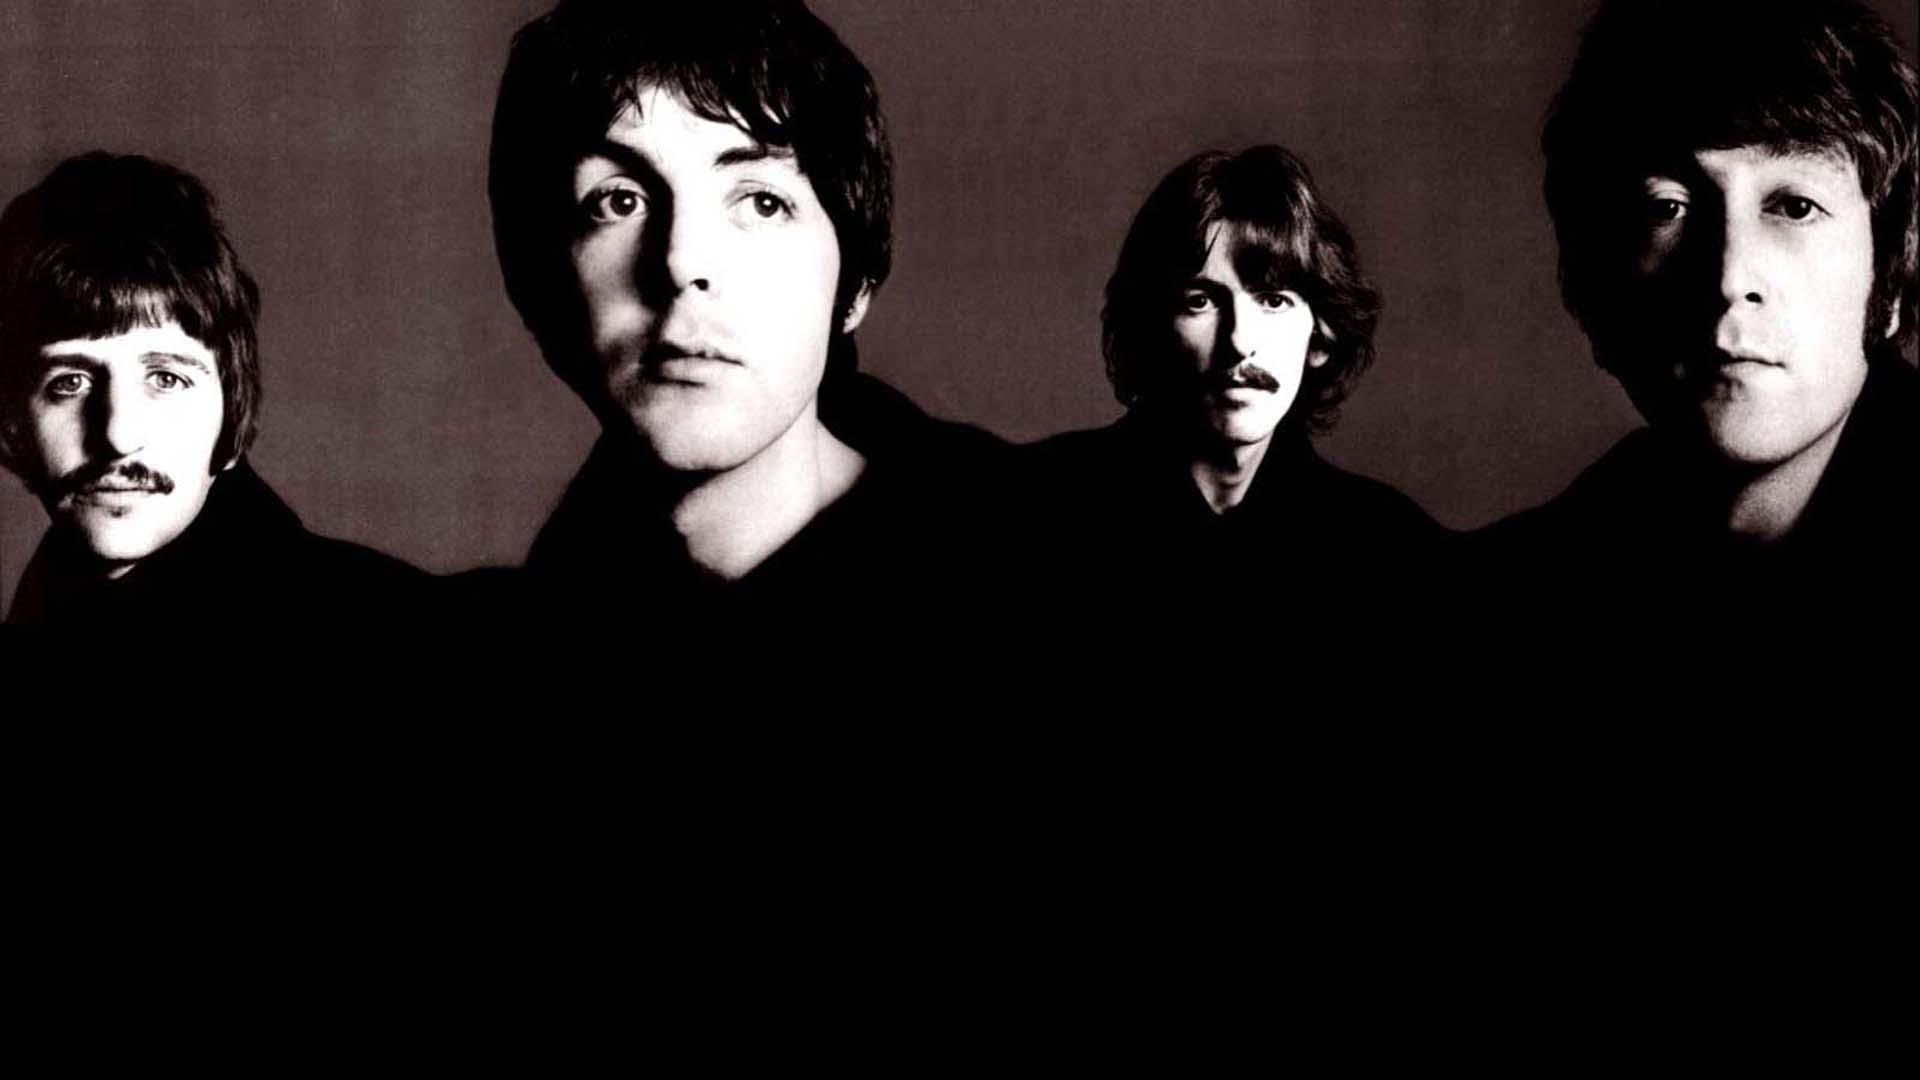 The Beatles Wallpaper IPhone